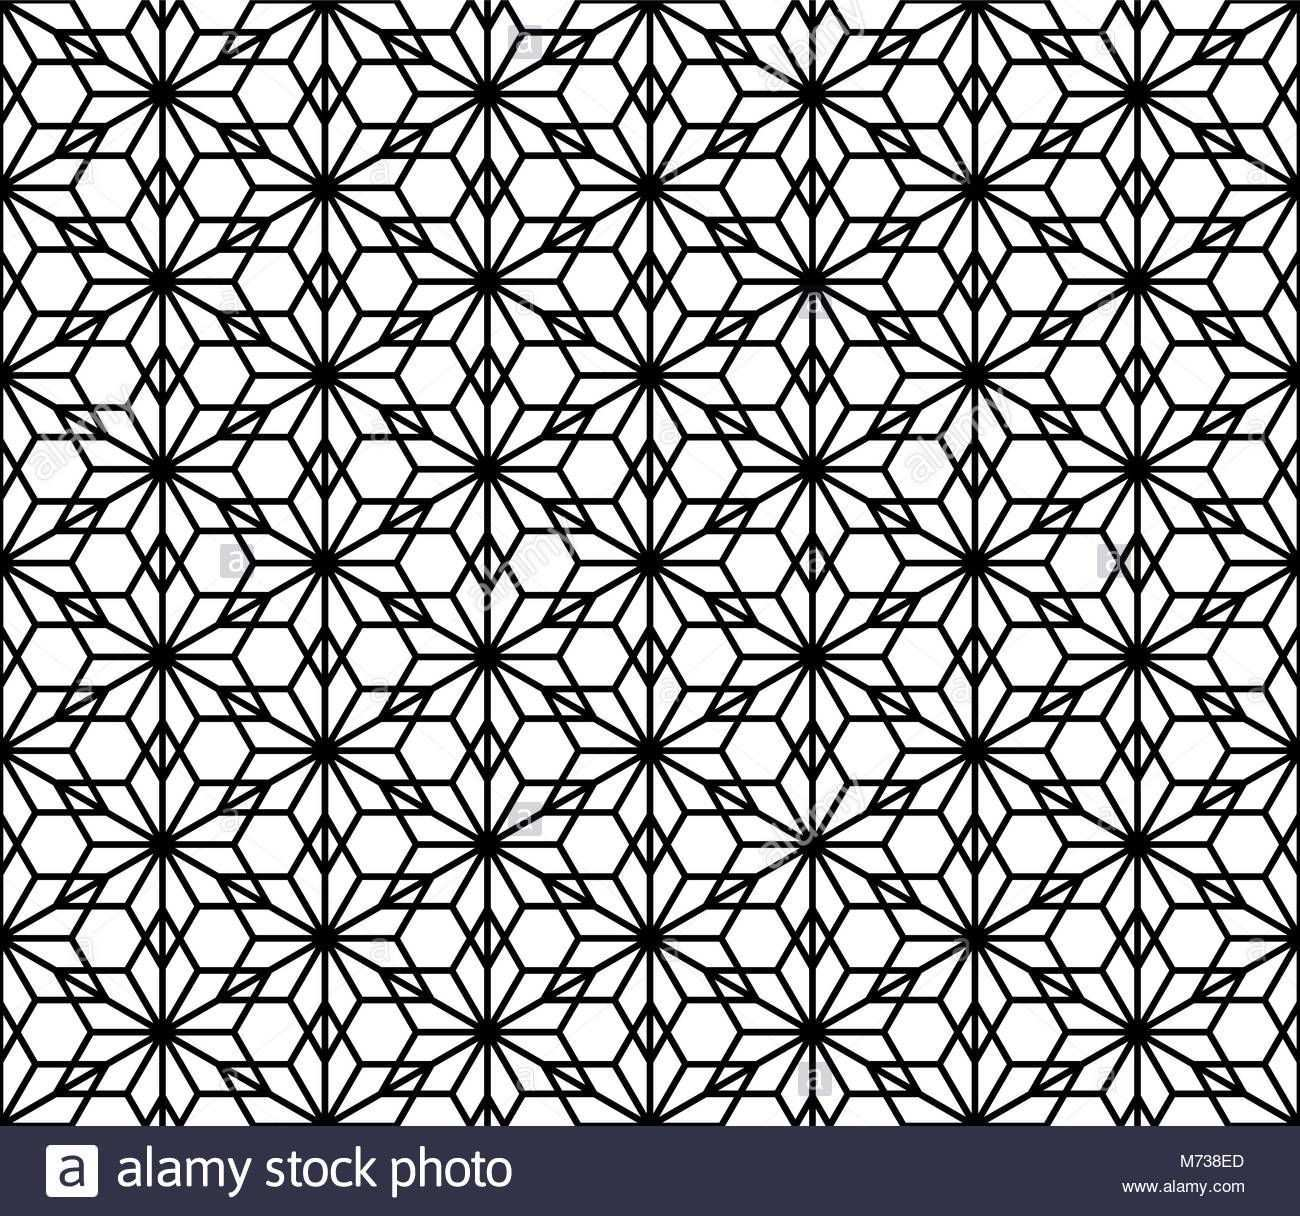 Nahtlose Traditionelle Japanische Ornament Kumiko Stock Vektor Geometrisches Musterdesign Geometrisches Mandala Tattoo Geometrie Tattoo